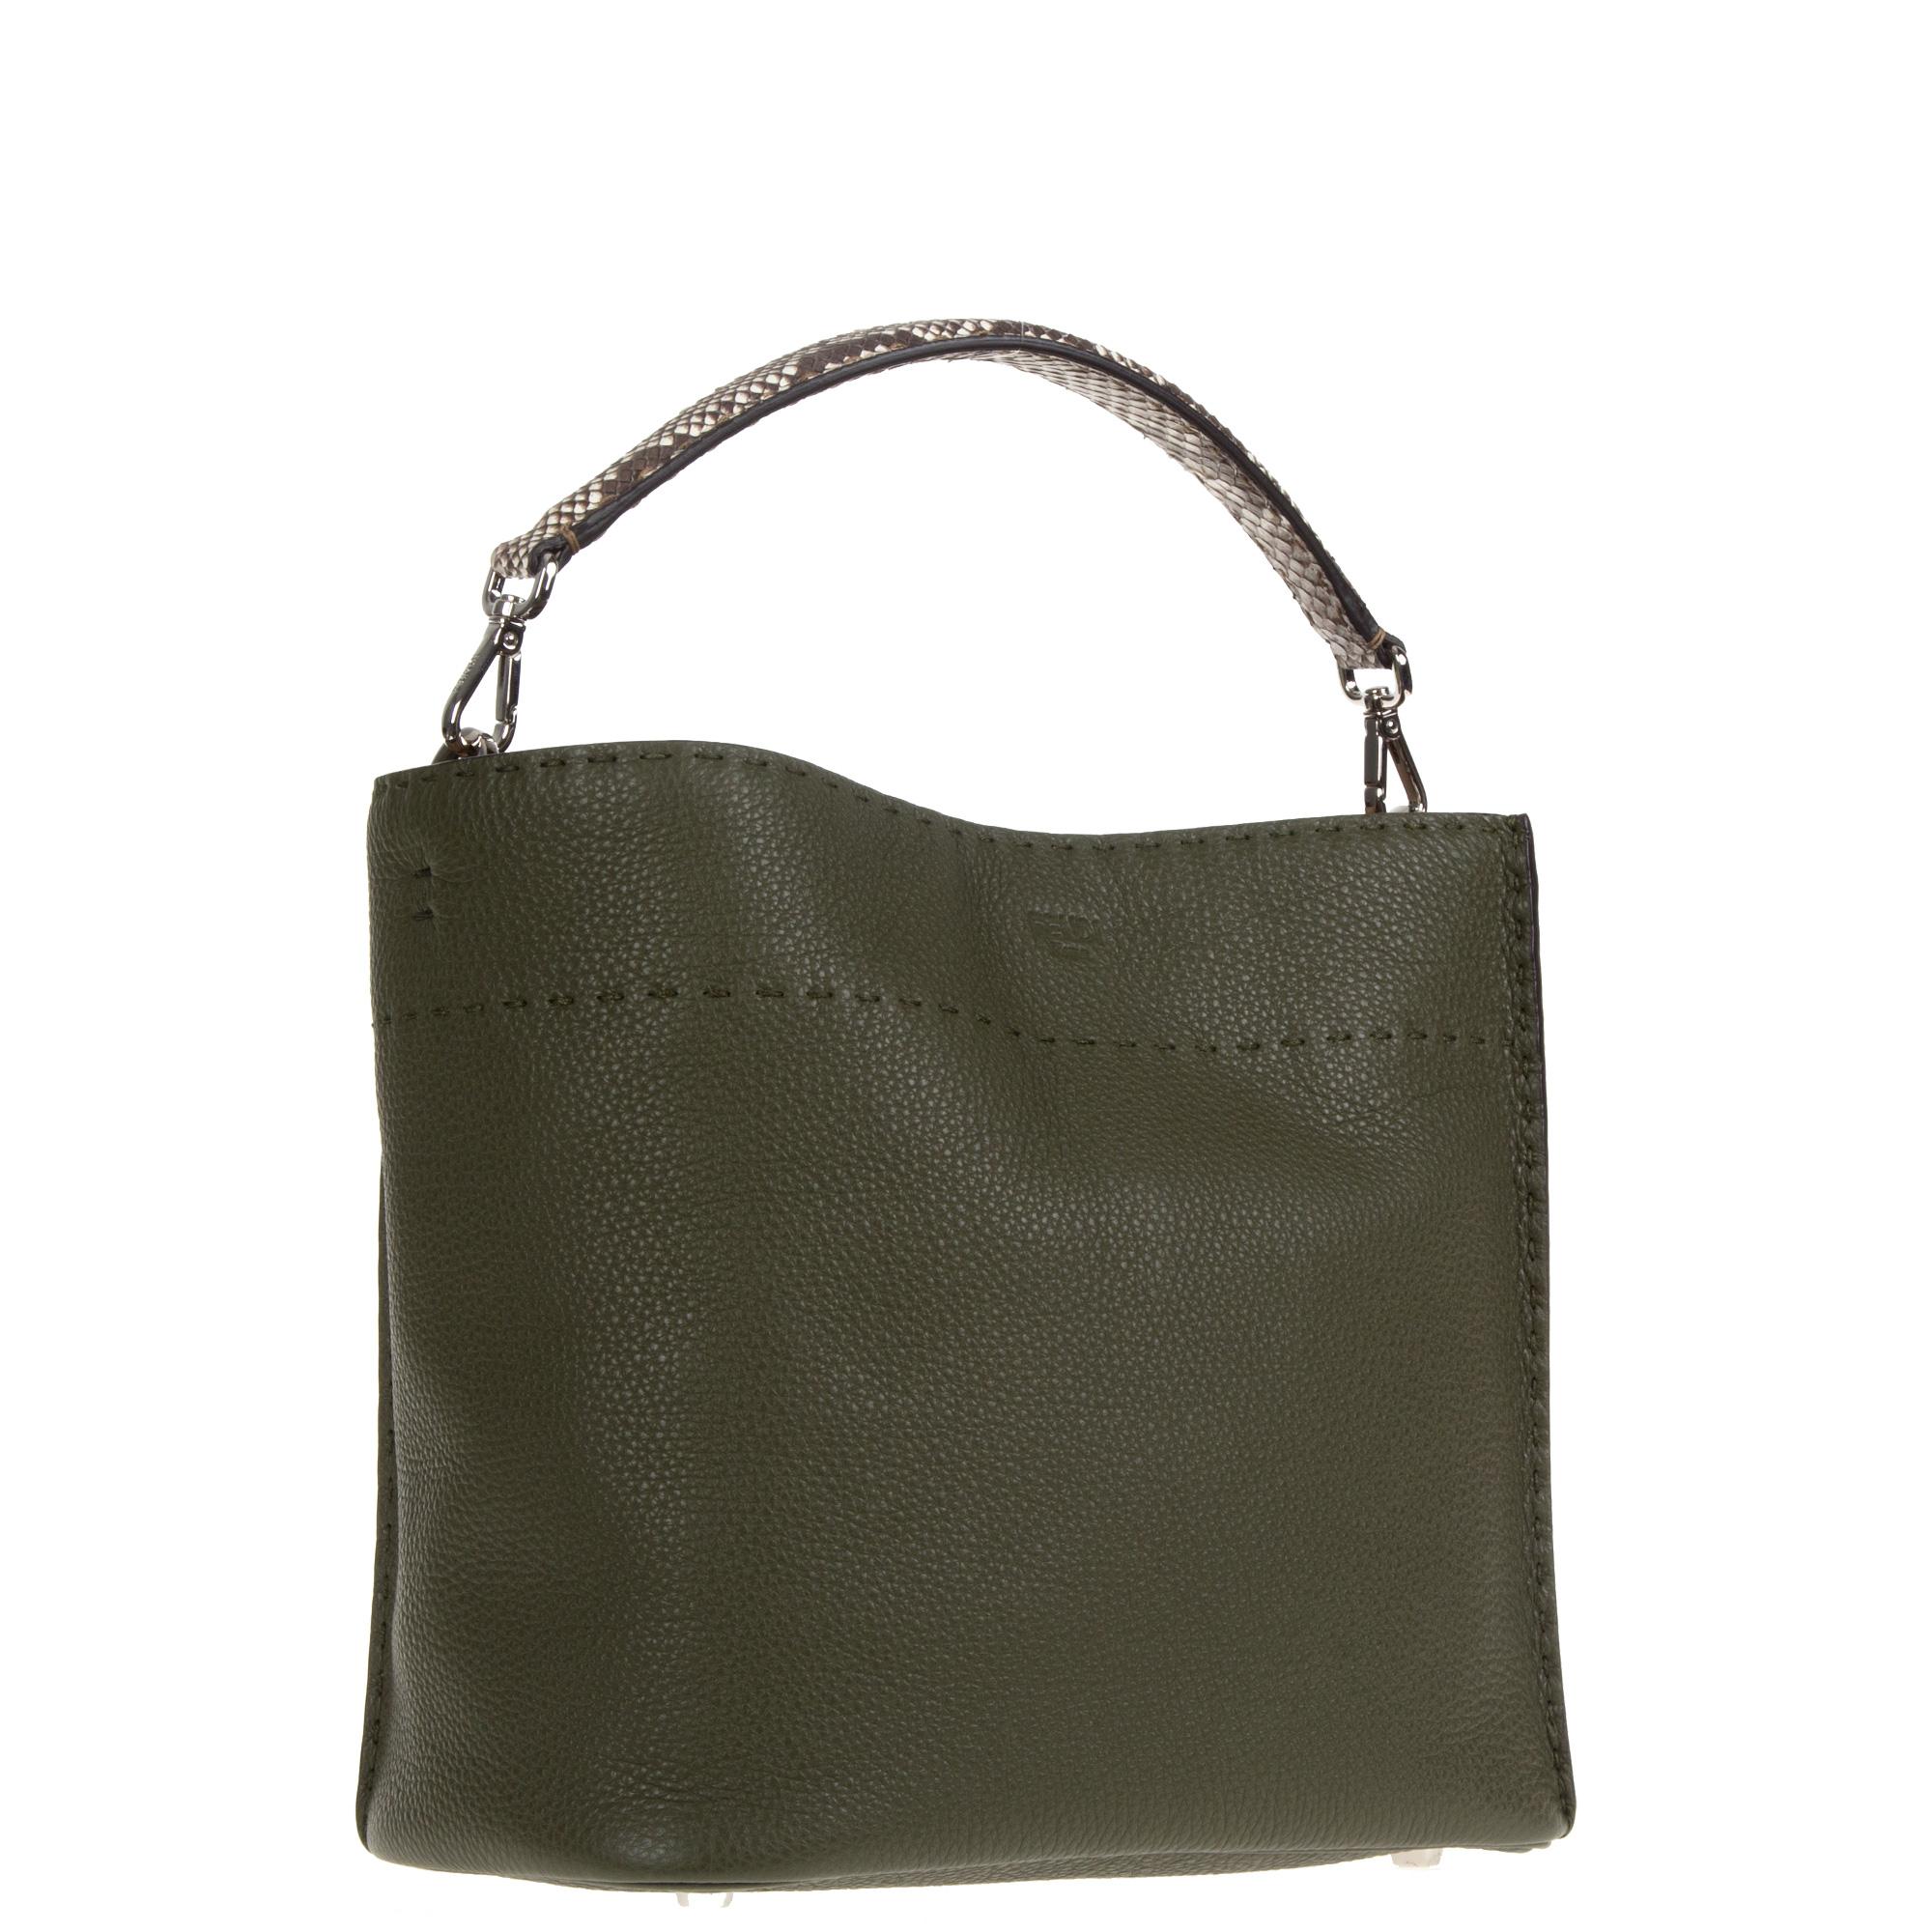 caf857c18e6d Fendi Green Bag. Lyst - Fendi Anna Small ...